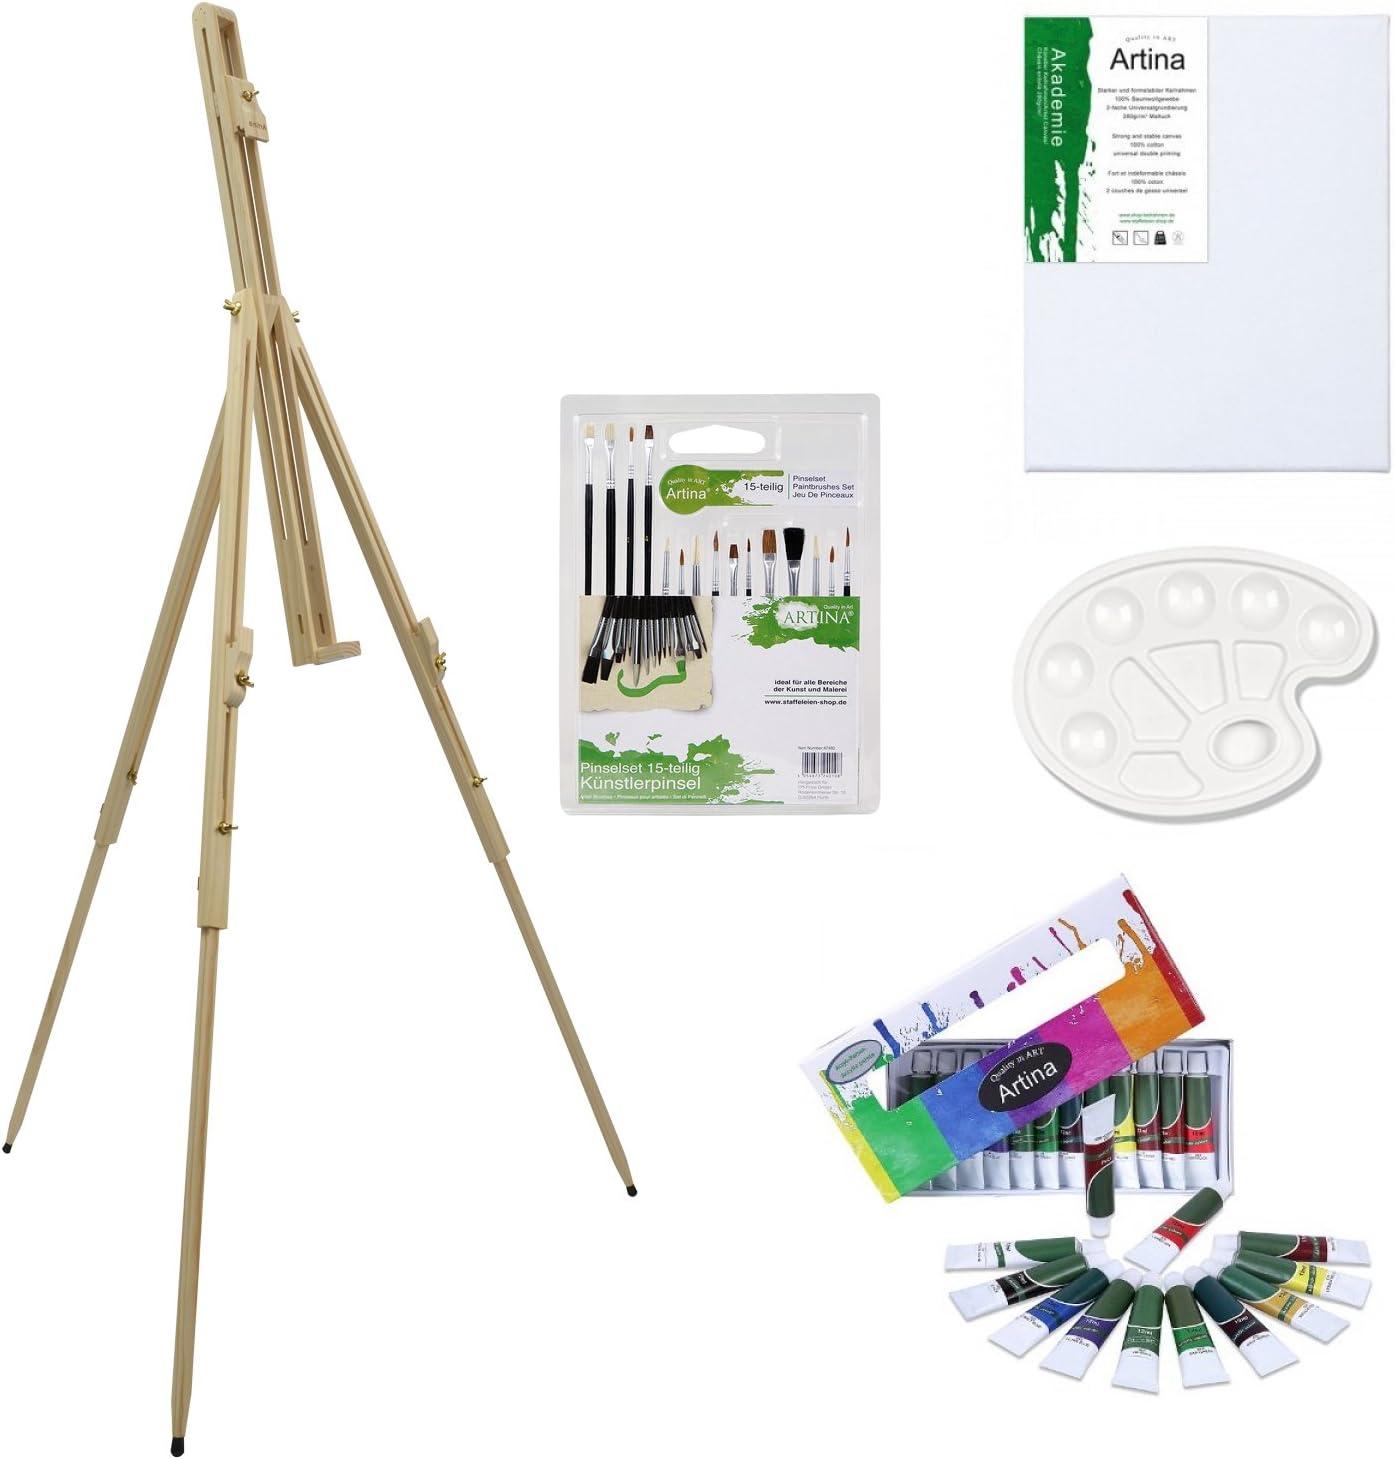 Feld Staffelei Sets 19,99 bis 24,99 Euro mit  Farbe Leinwand komplette Sets